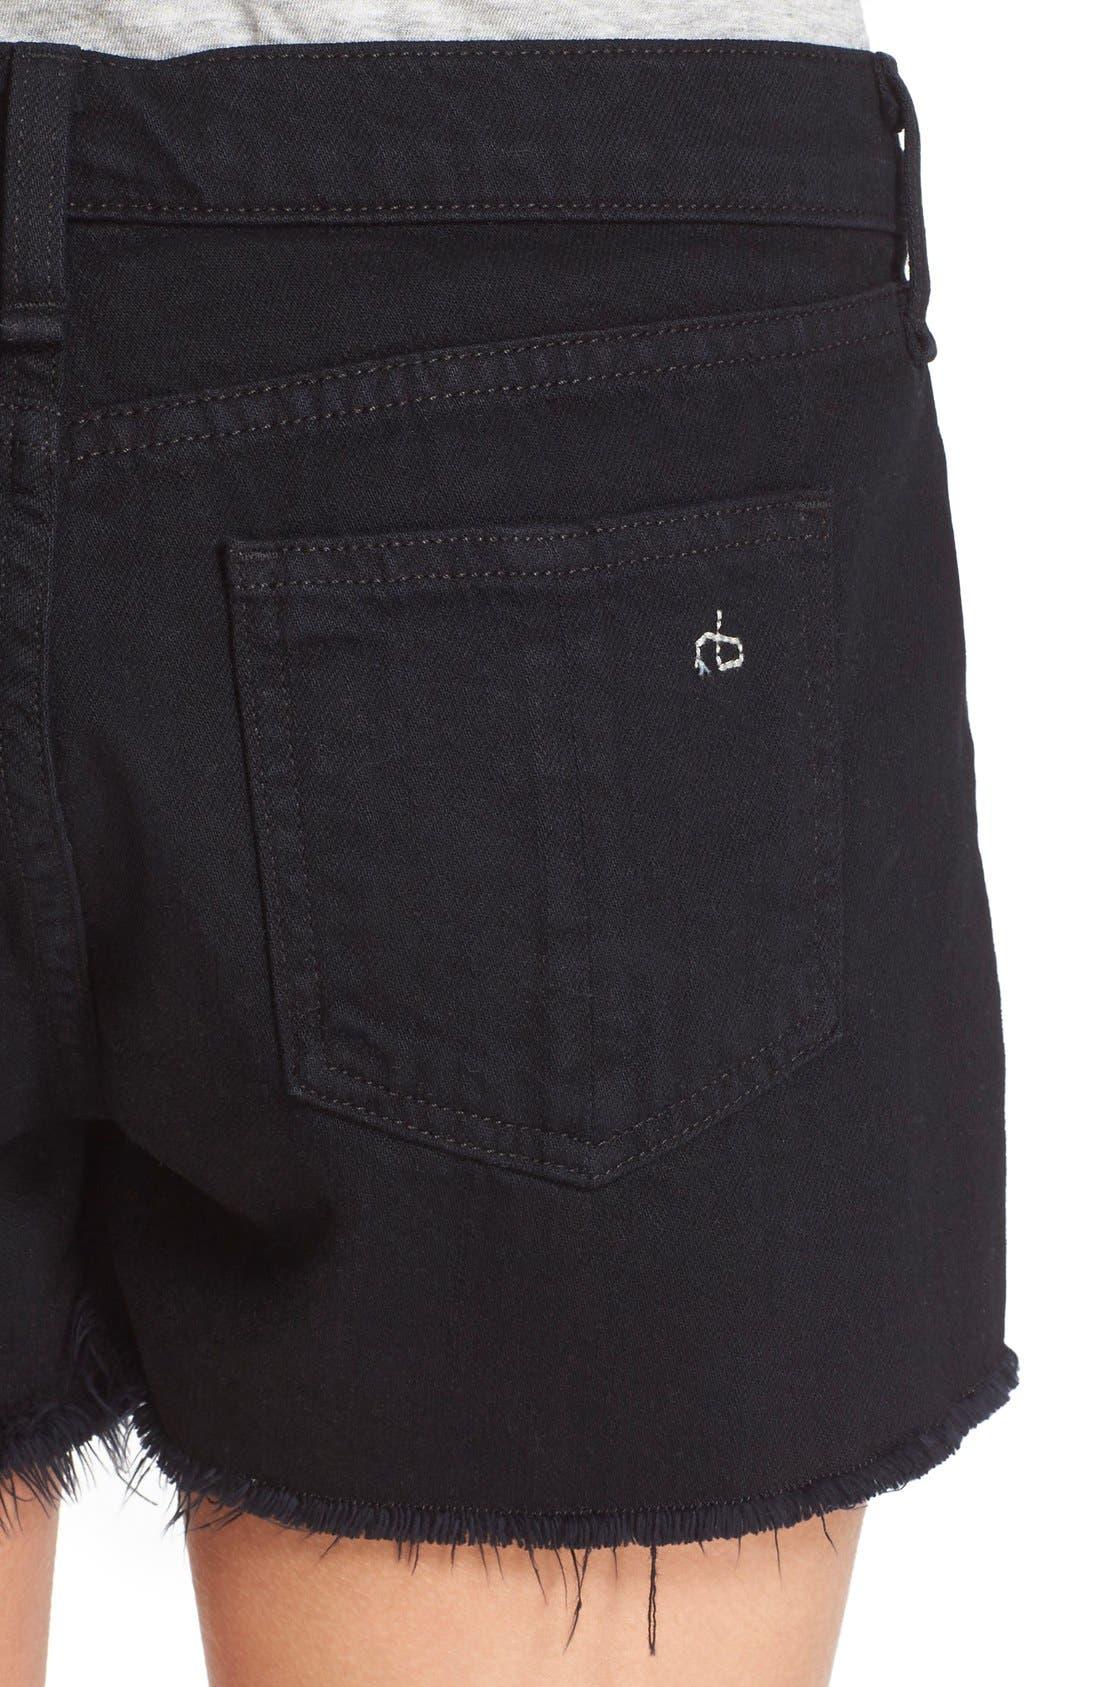 Cutoff Denim Shorts,                             Alternate thumbnail 4, color,                             Black Frpr